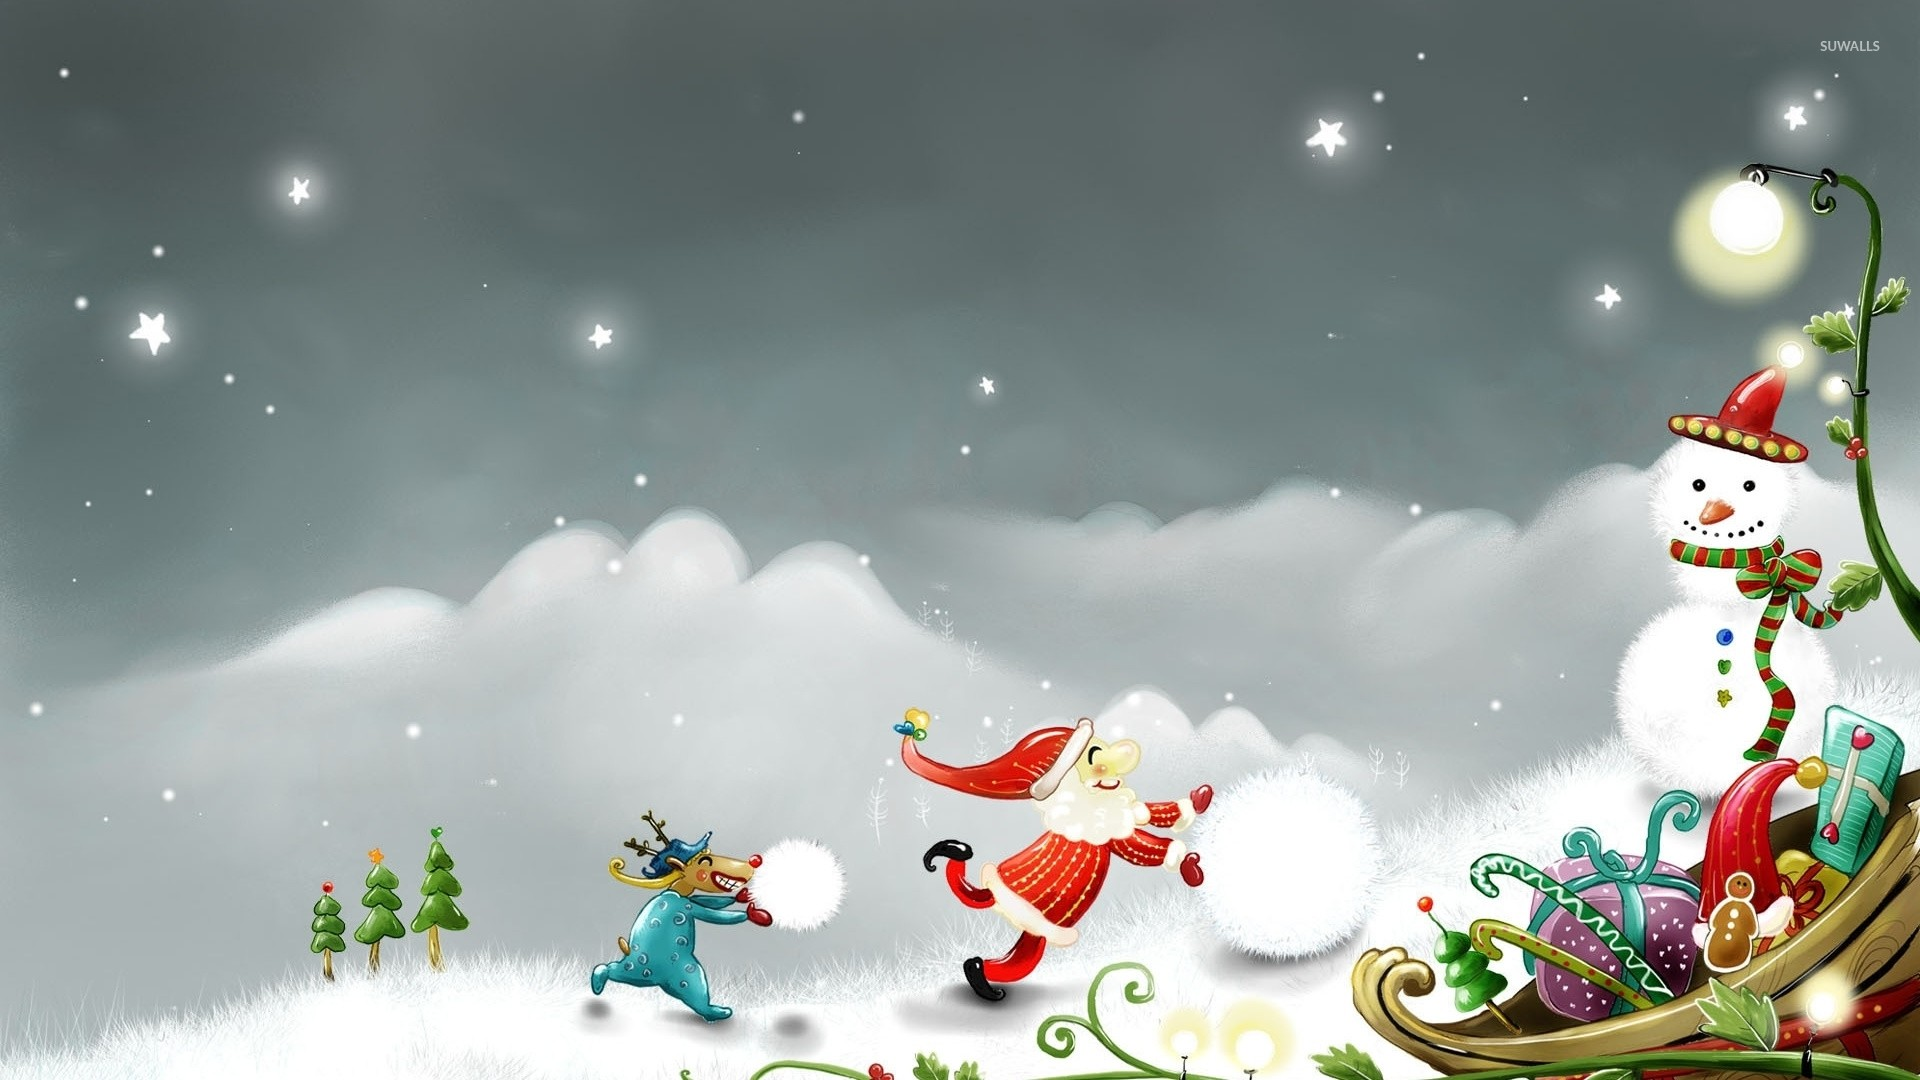 1920x1080 Christmas Snowman Wallpaper A Snow Moon